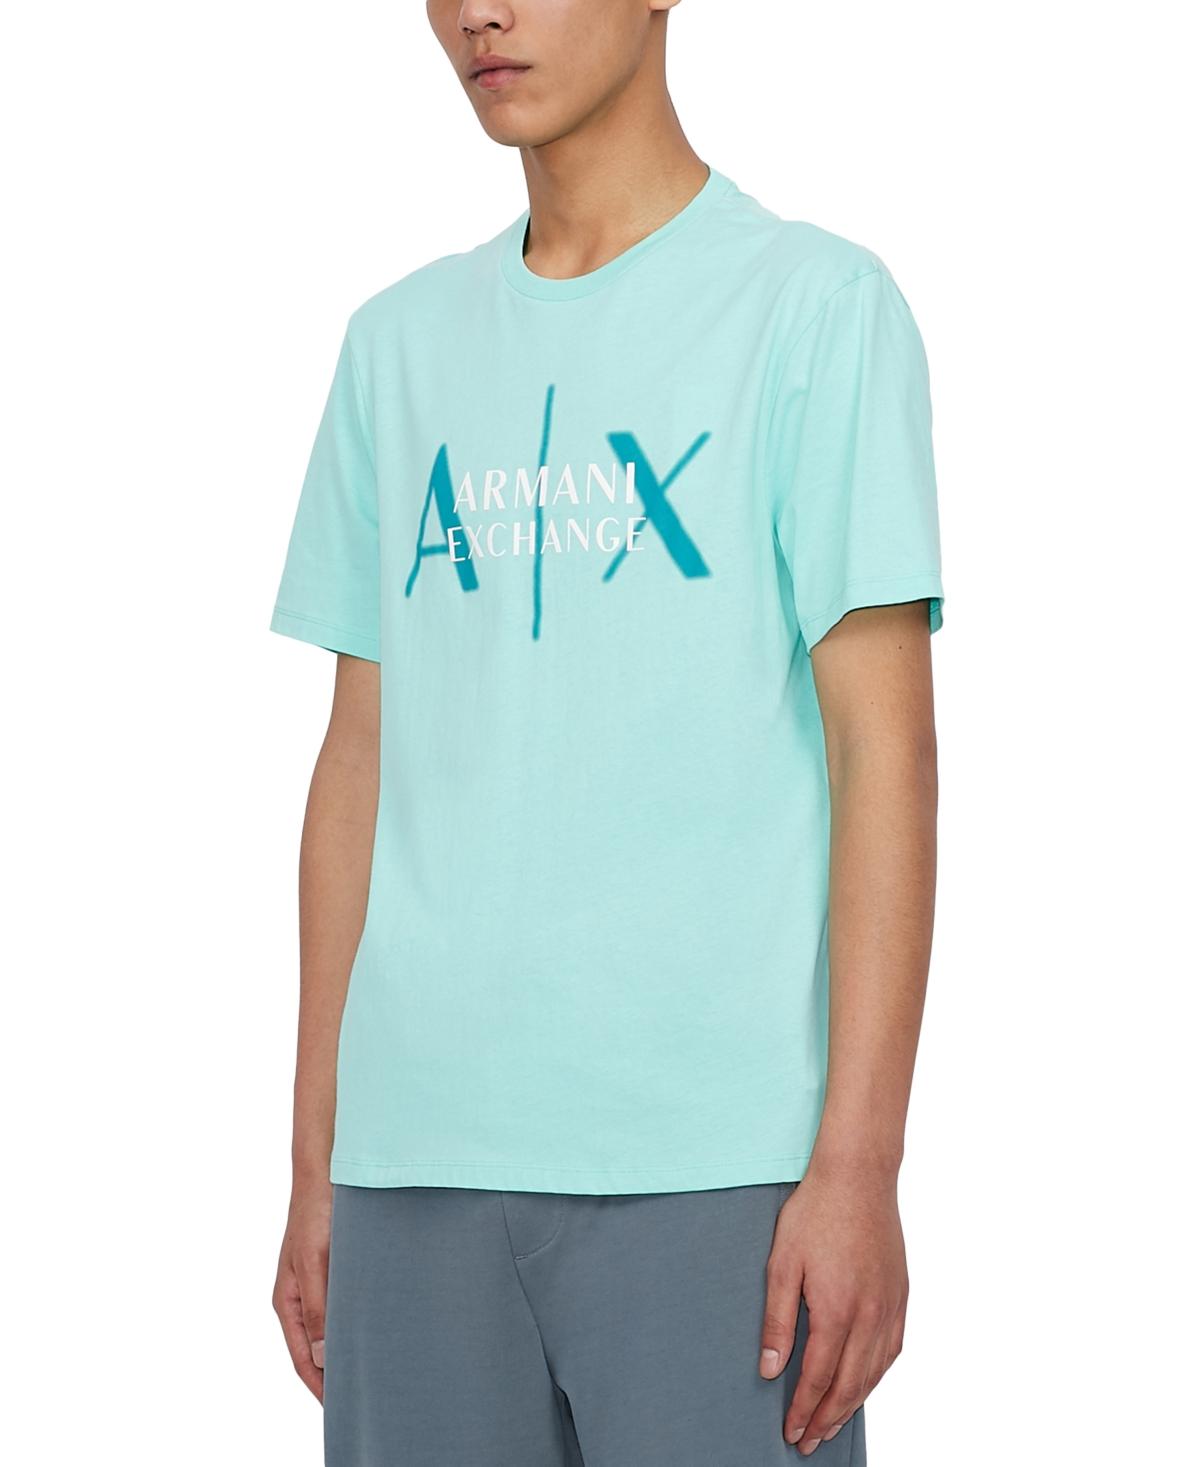 18986653 fpx - Men Fashion